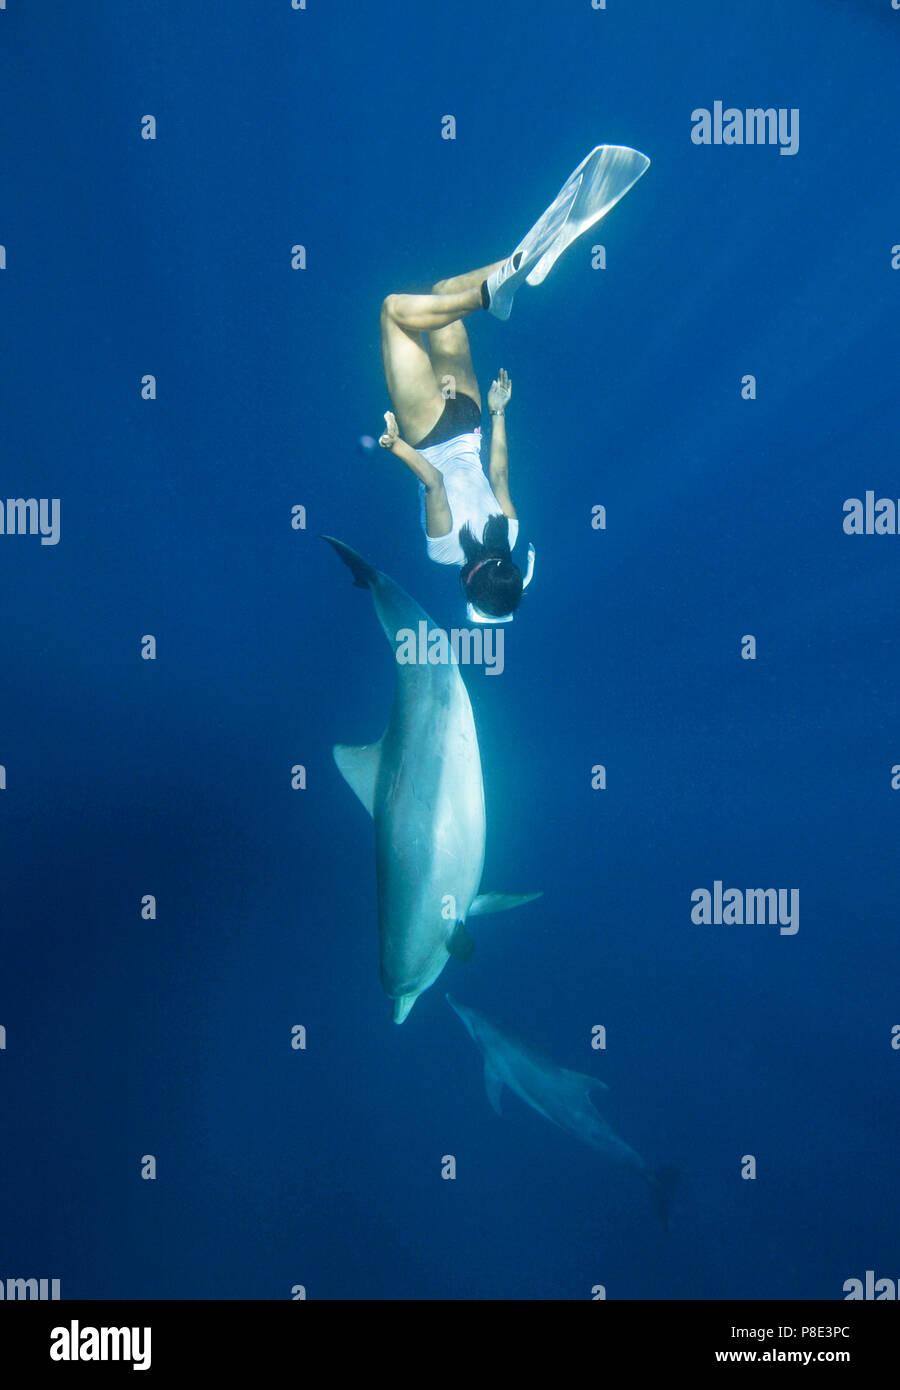 Female snorkeler and Indo-Pacific bottlenose dolphin (Tursiops aduncus), Ogasawara, Japan - Stock Image